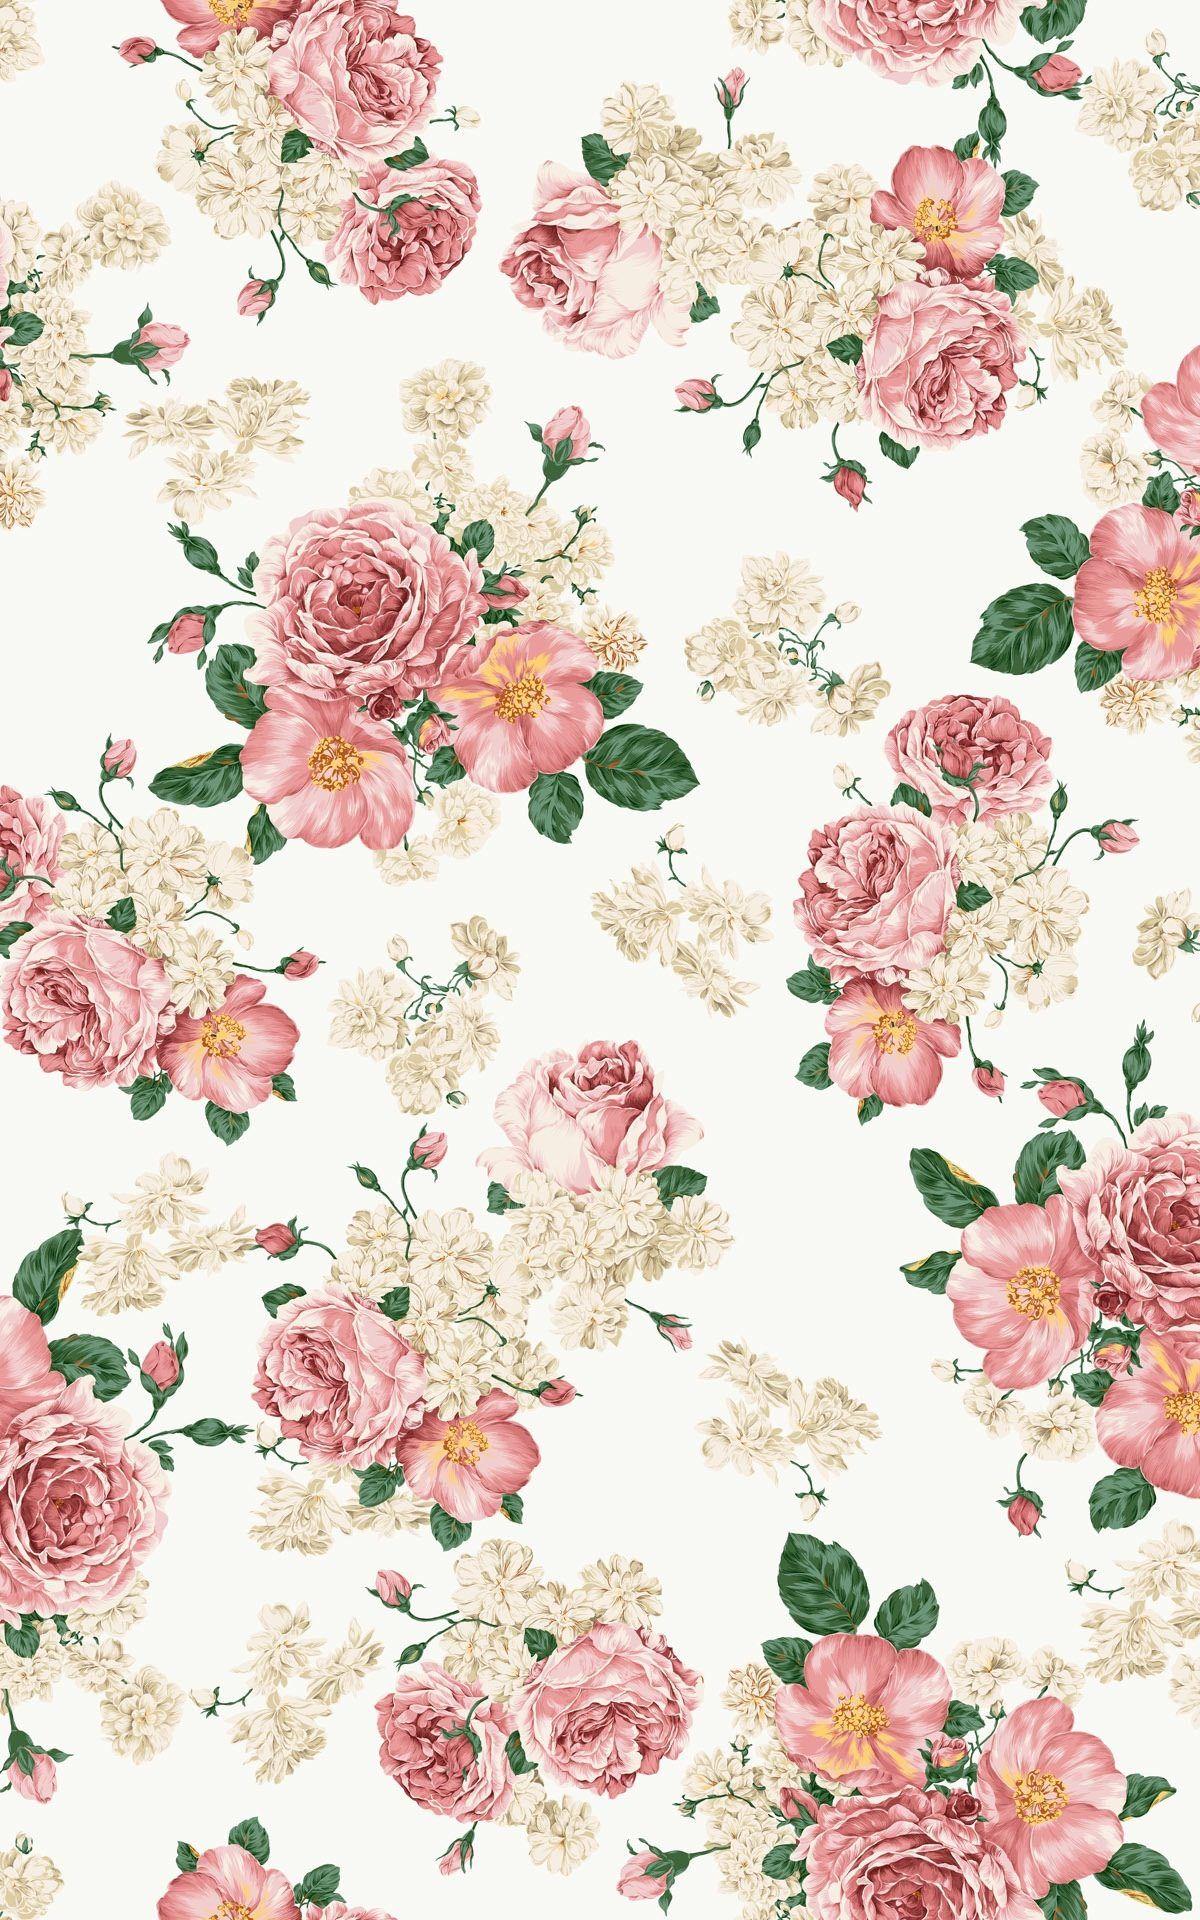 Pink Flower Wallpaper Wide Click Wallpapers Floral Wallpaper Iphone Vintage Flowers Wallpaper Pink Flowers Wallpaper